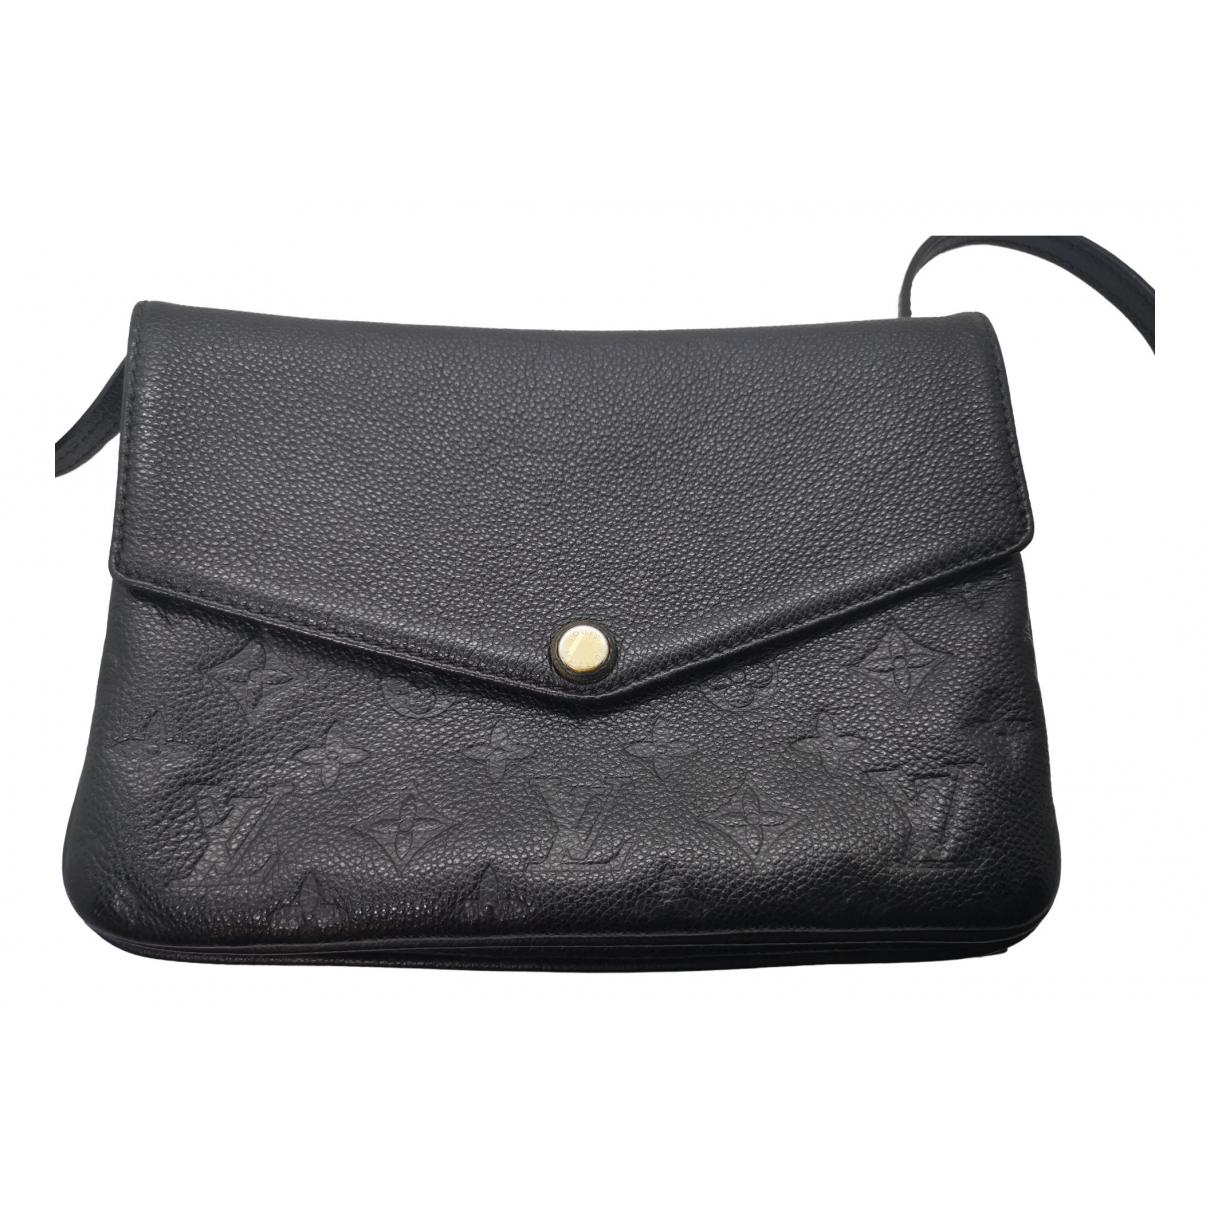 Louis Vuitton Twice Black Leather handbag for Women \N